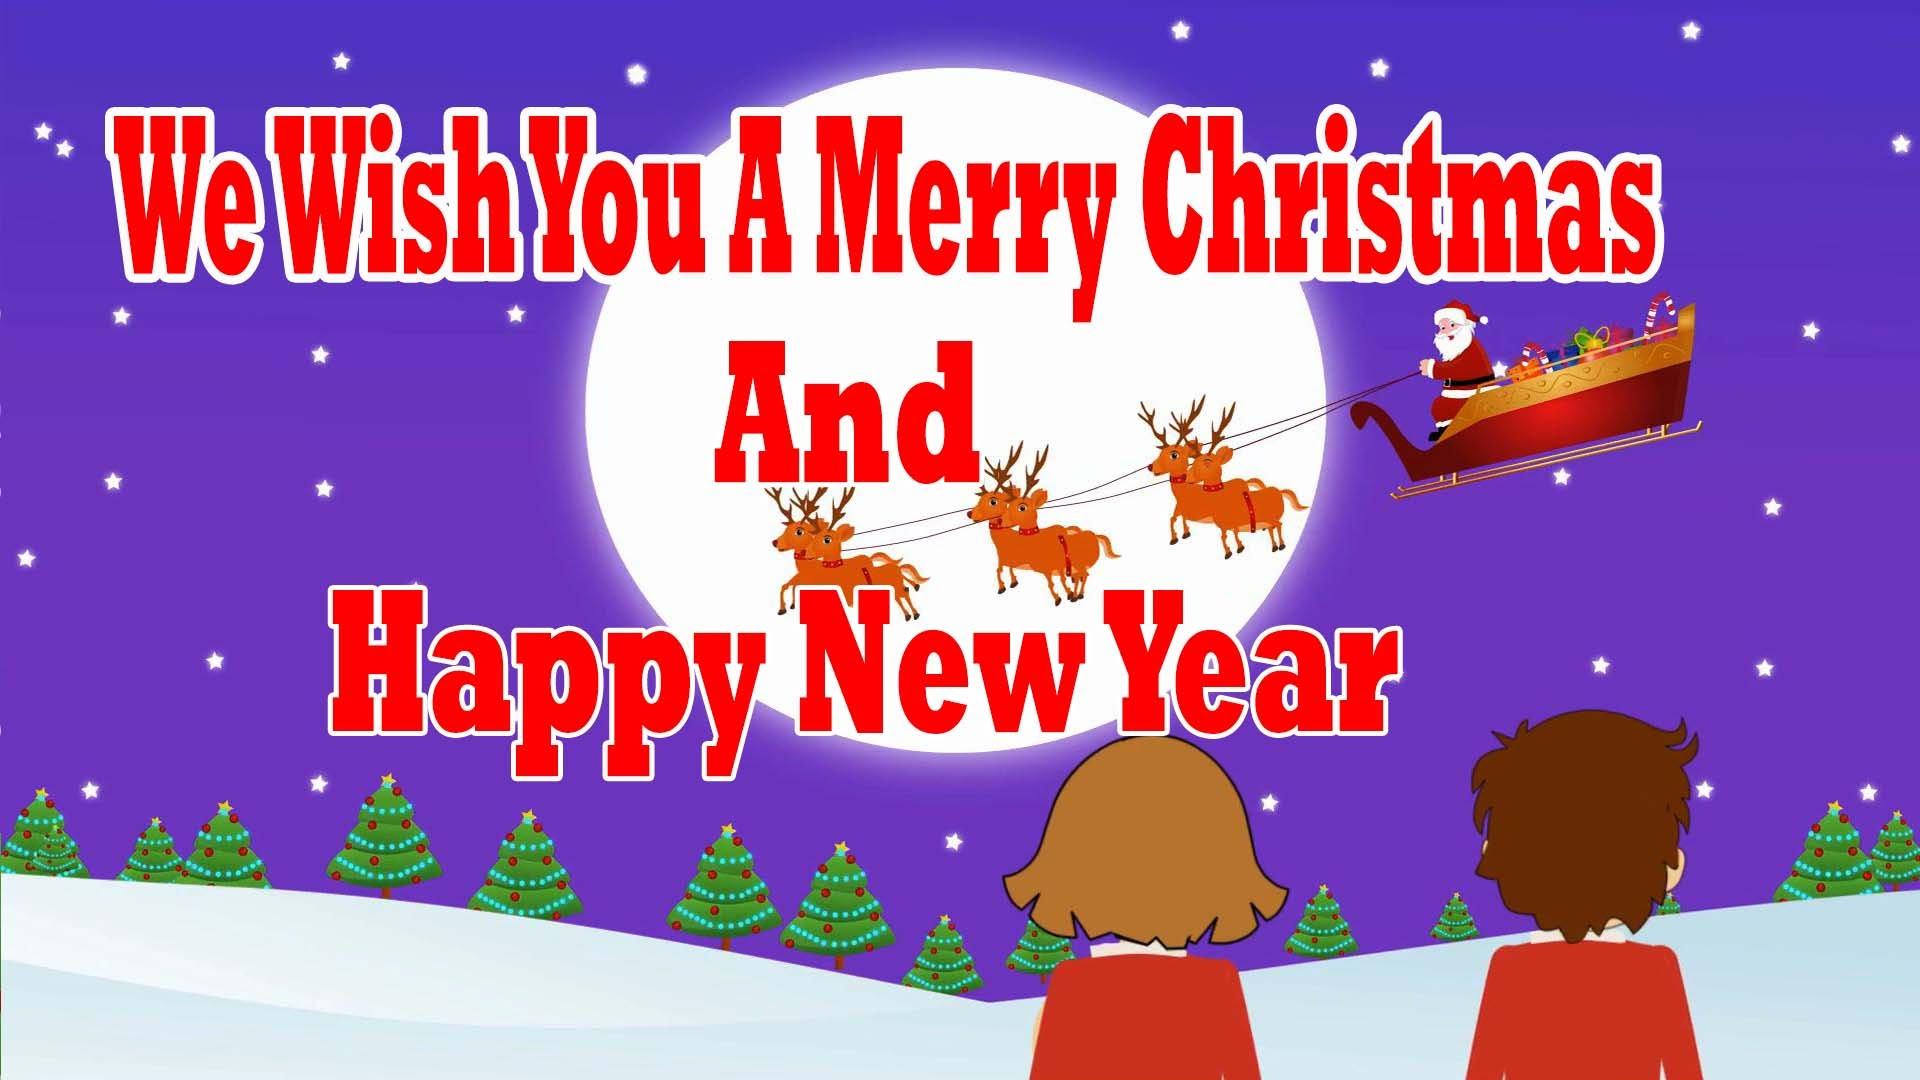 Merry-Christmas-Happy-New-Year-2017